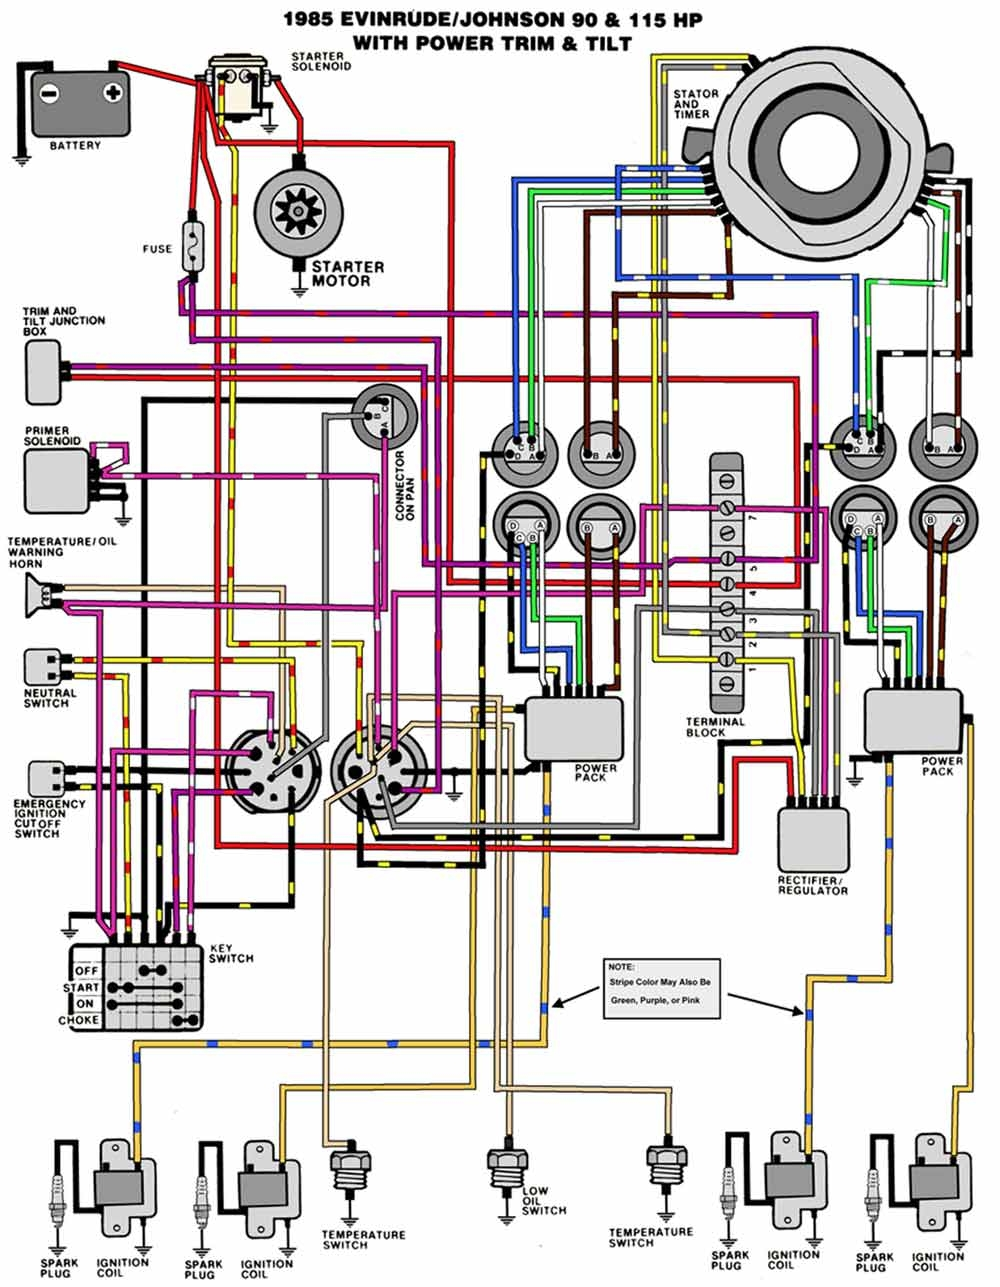 medium resolution of evinrude ignition switch wiring diagram johnson wiring diagram circuit connection diagram u2022 rh scooplocal co